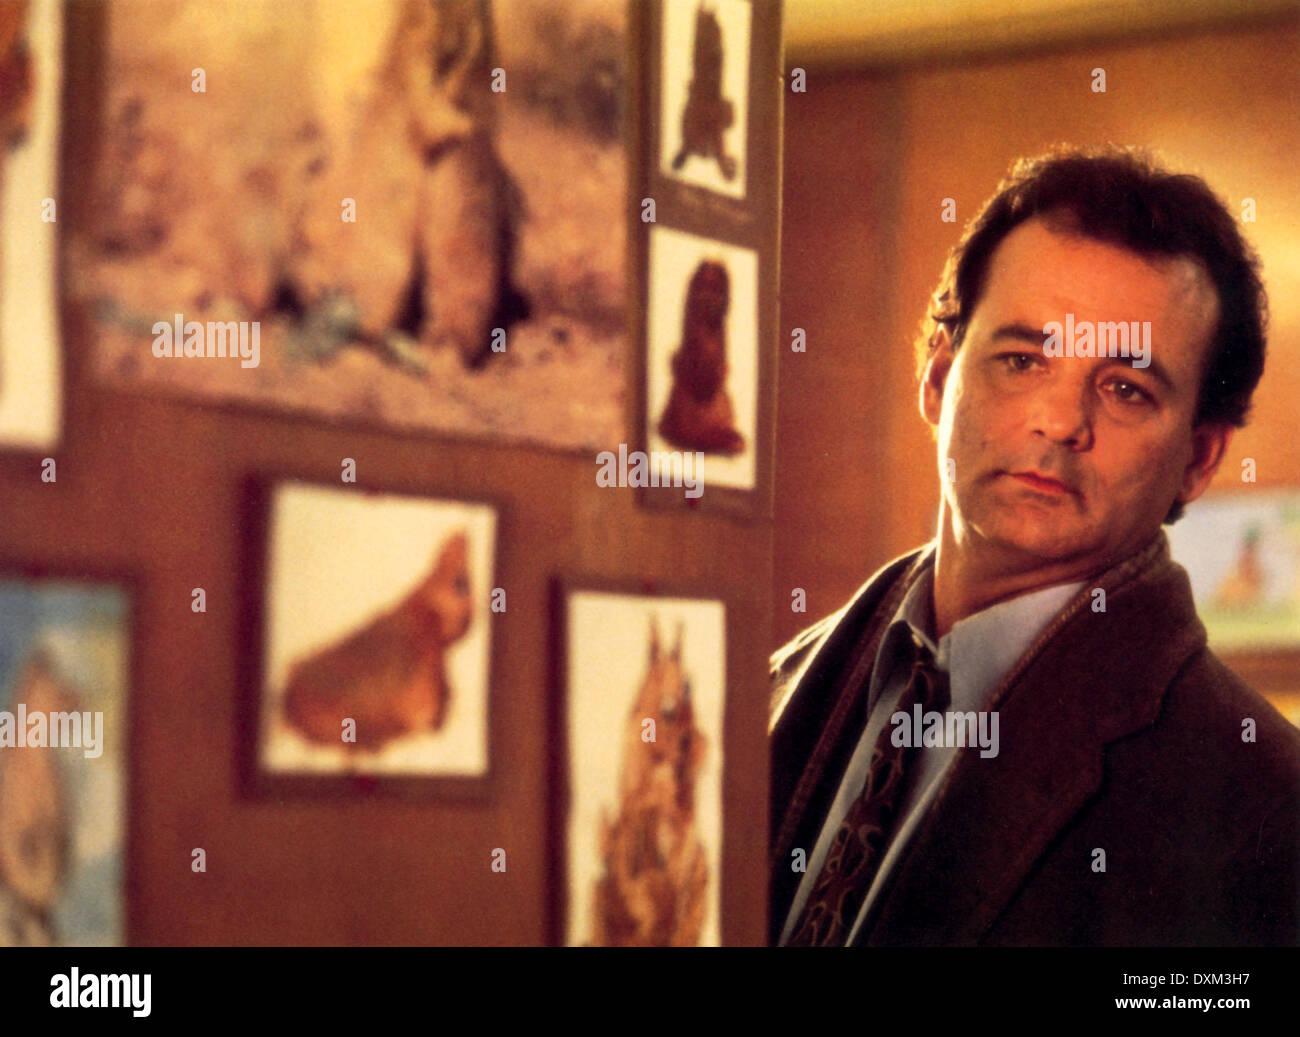 Groundhog Day Film Immagini e Fotos Stock - Alamy